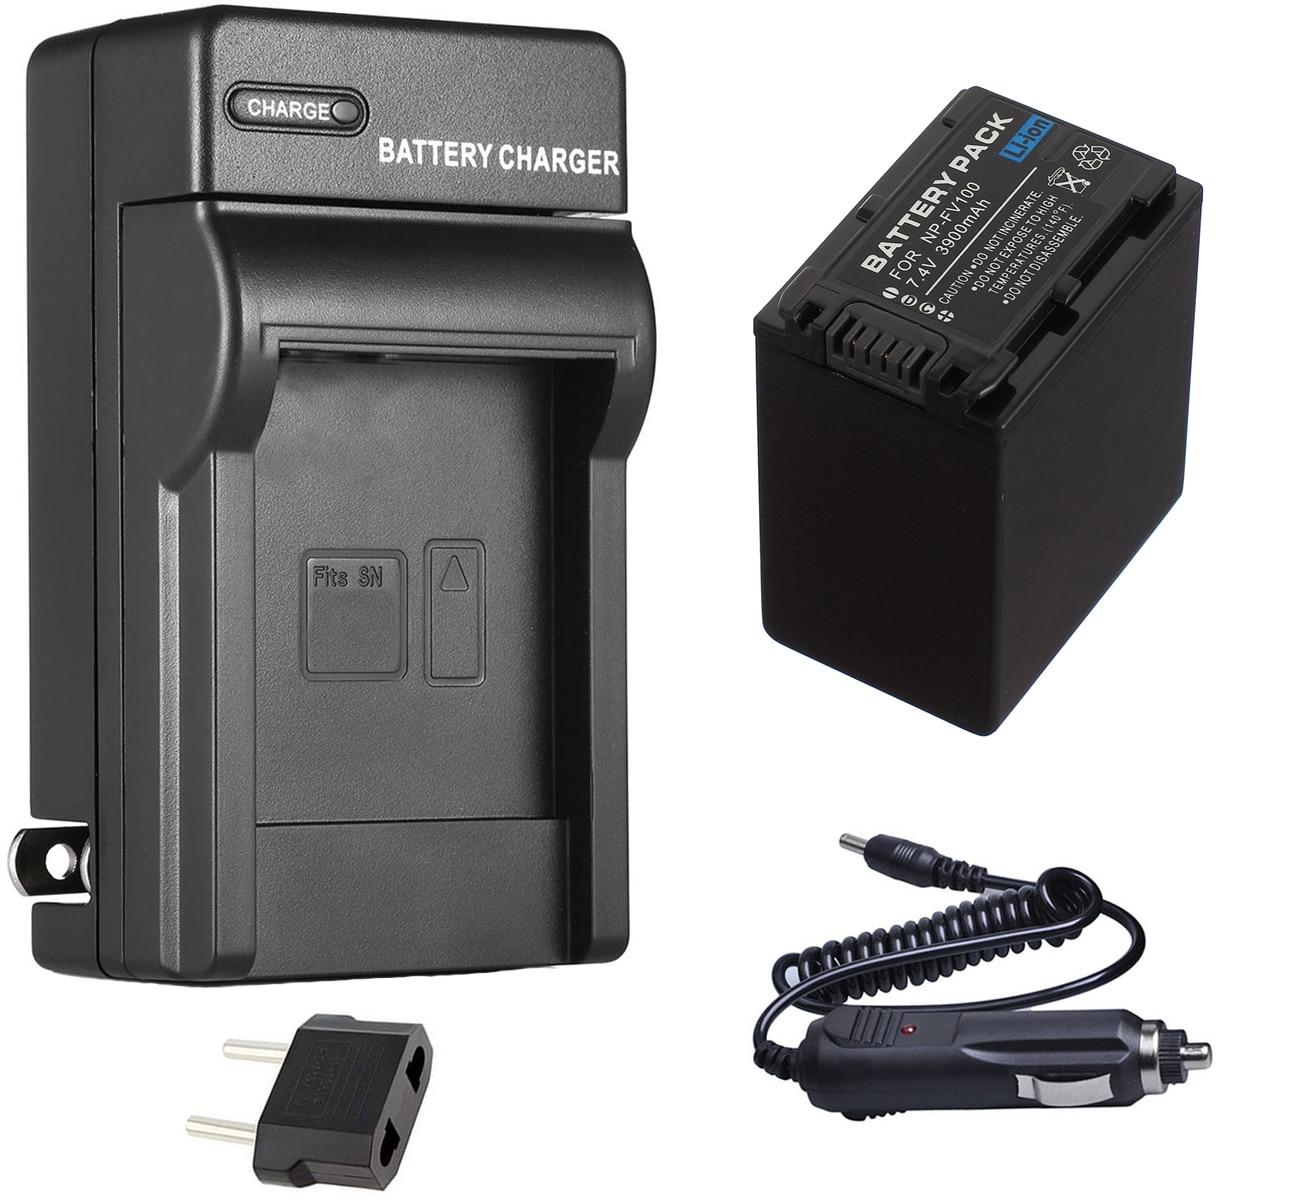 Paquete de batería + cargador para Sony Handycam HDR-CX110, HDR-CX130, HDR-CX150, HDR-CX155,...